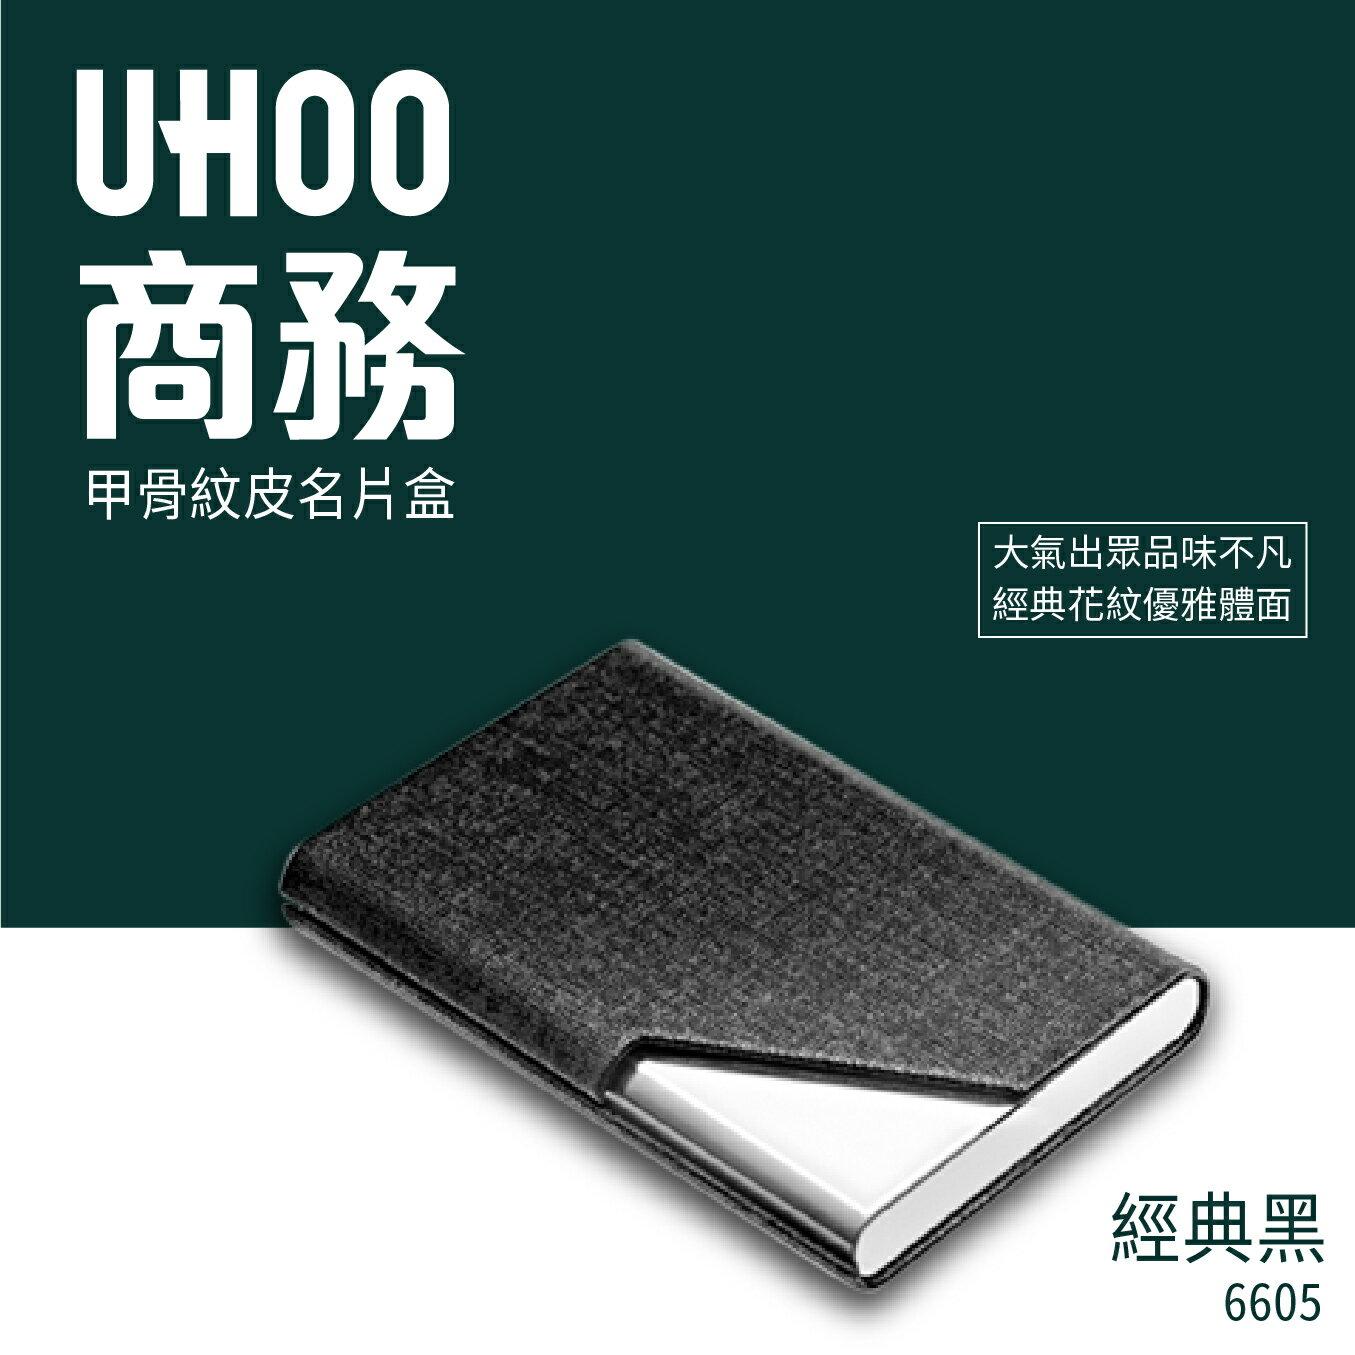 UHOO 6605 商務名片盒(黑)名片夾 業務 盒子 名片收納 自我介紹 商務交流 合作名片 卡夾 車票夾 證件夾